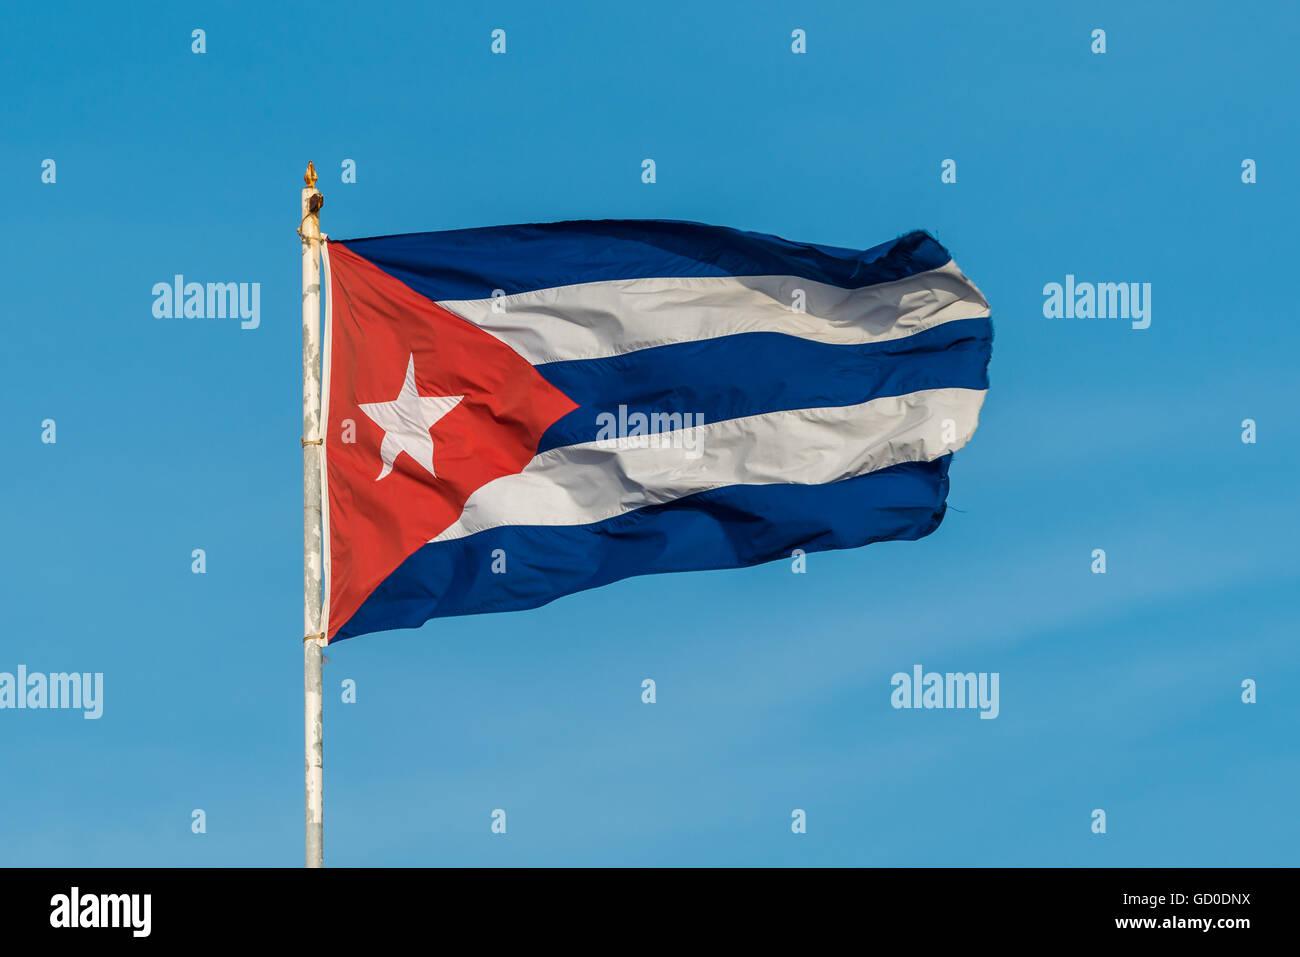 A Cuban flag flies high above the city of Havana. - Stock Image